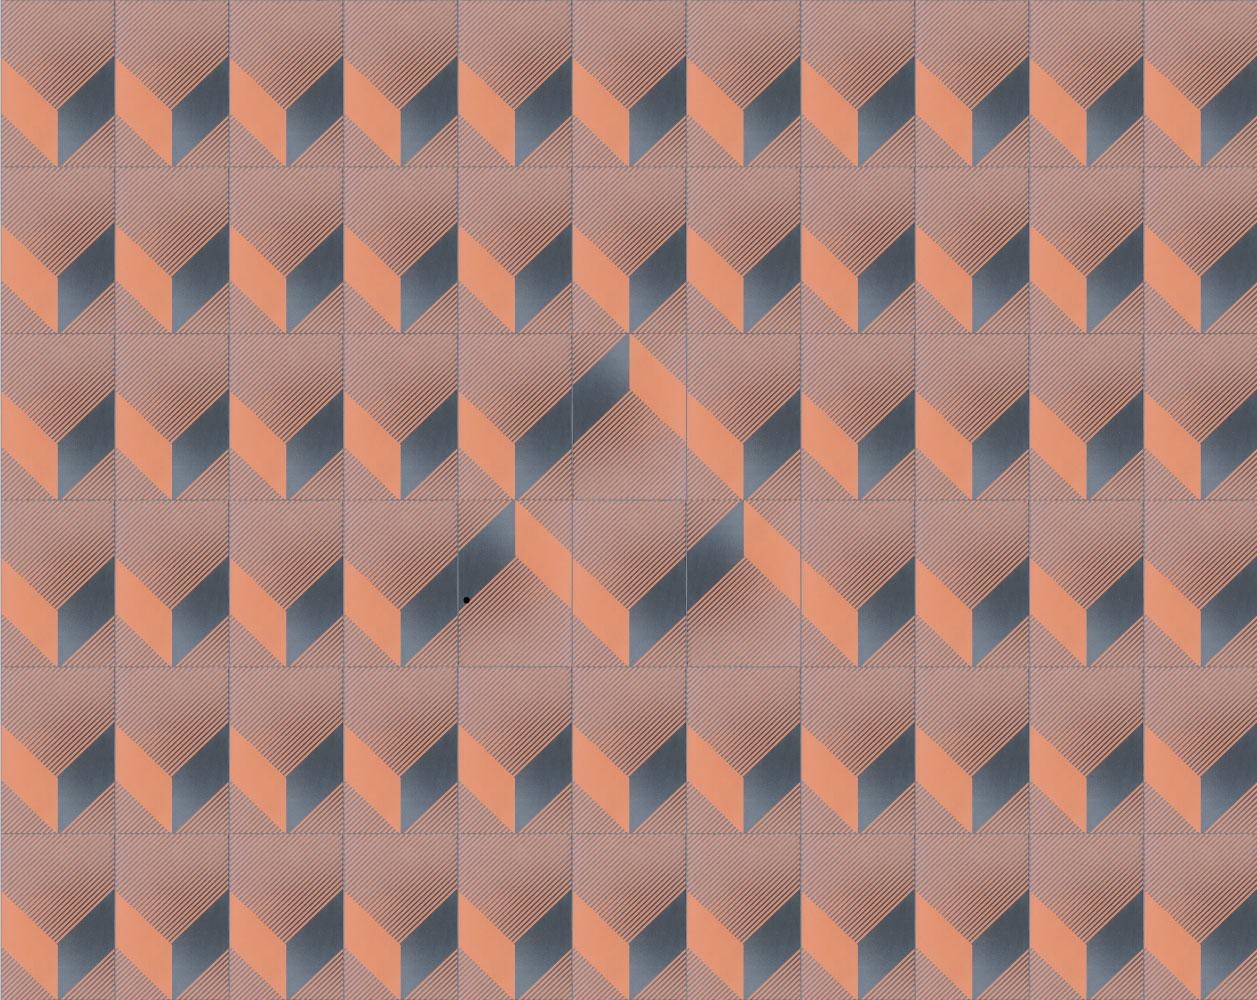 geometrico_mur01_2leg